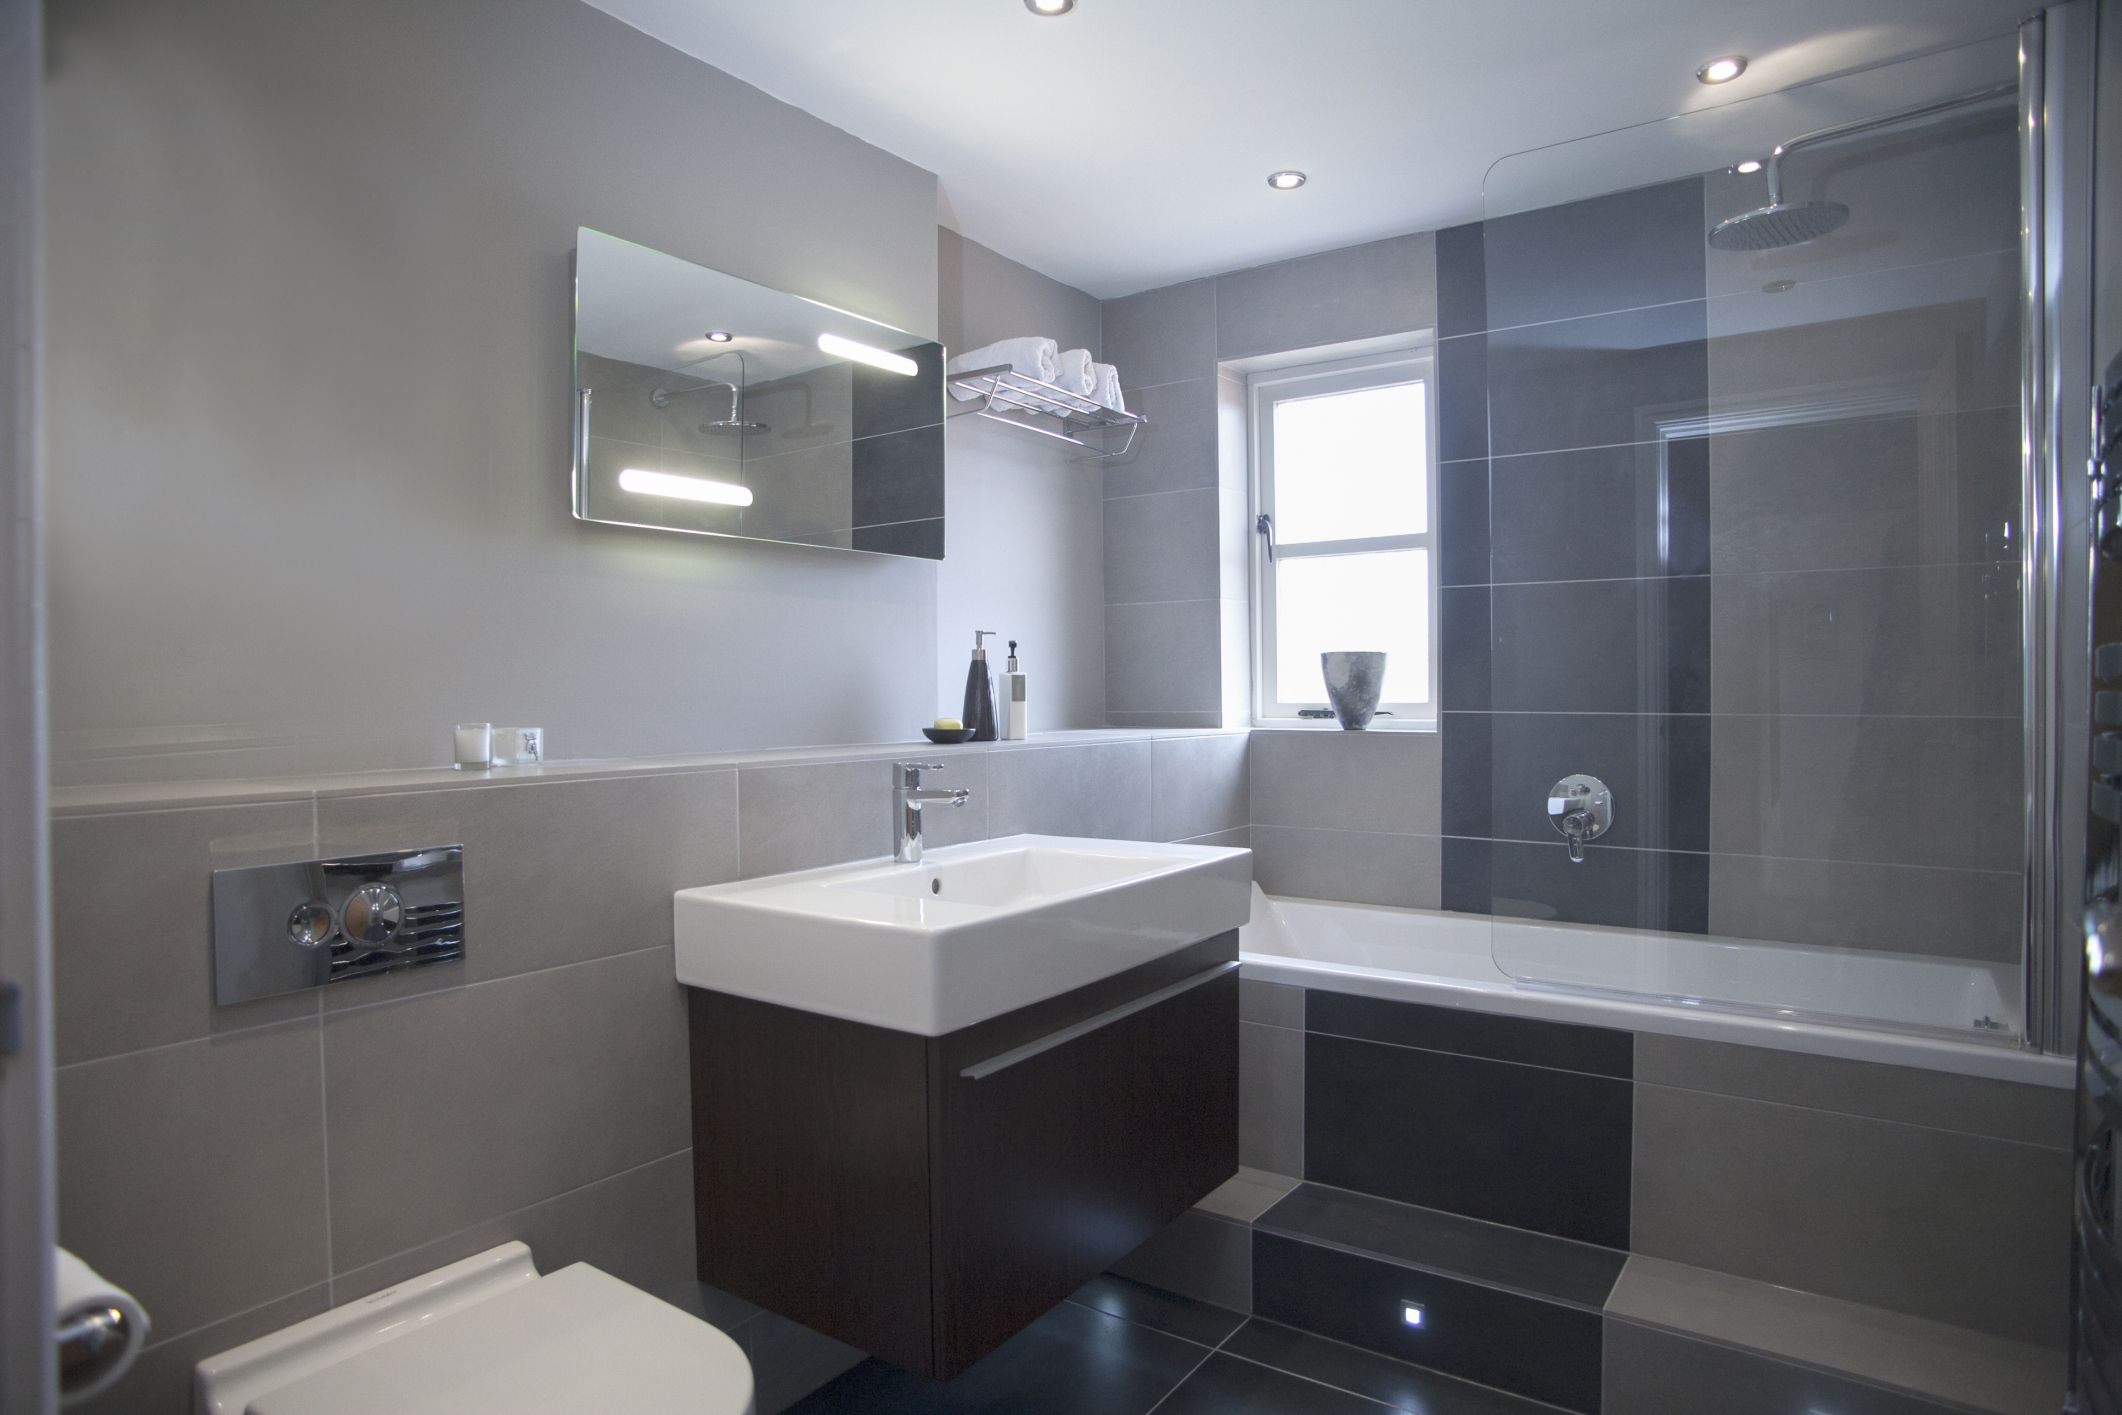 Wainscot bathroom pictures - Wainscot Bathroom Pictures 29